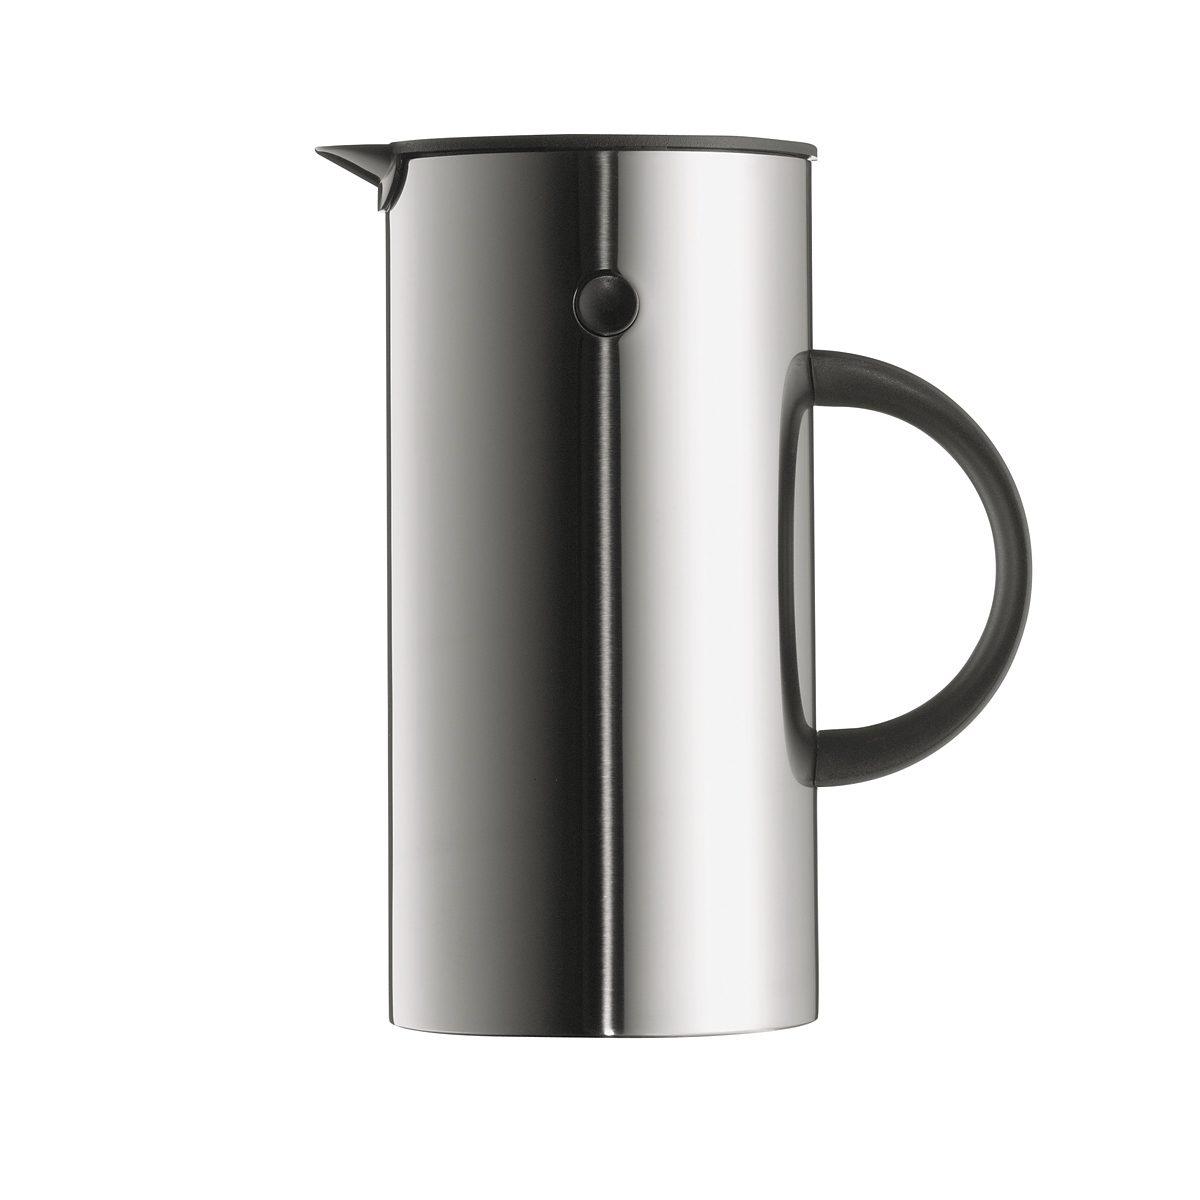 STELTON Stelton Kaffeezubereiter 1 l Edelstahl